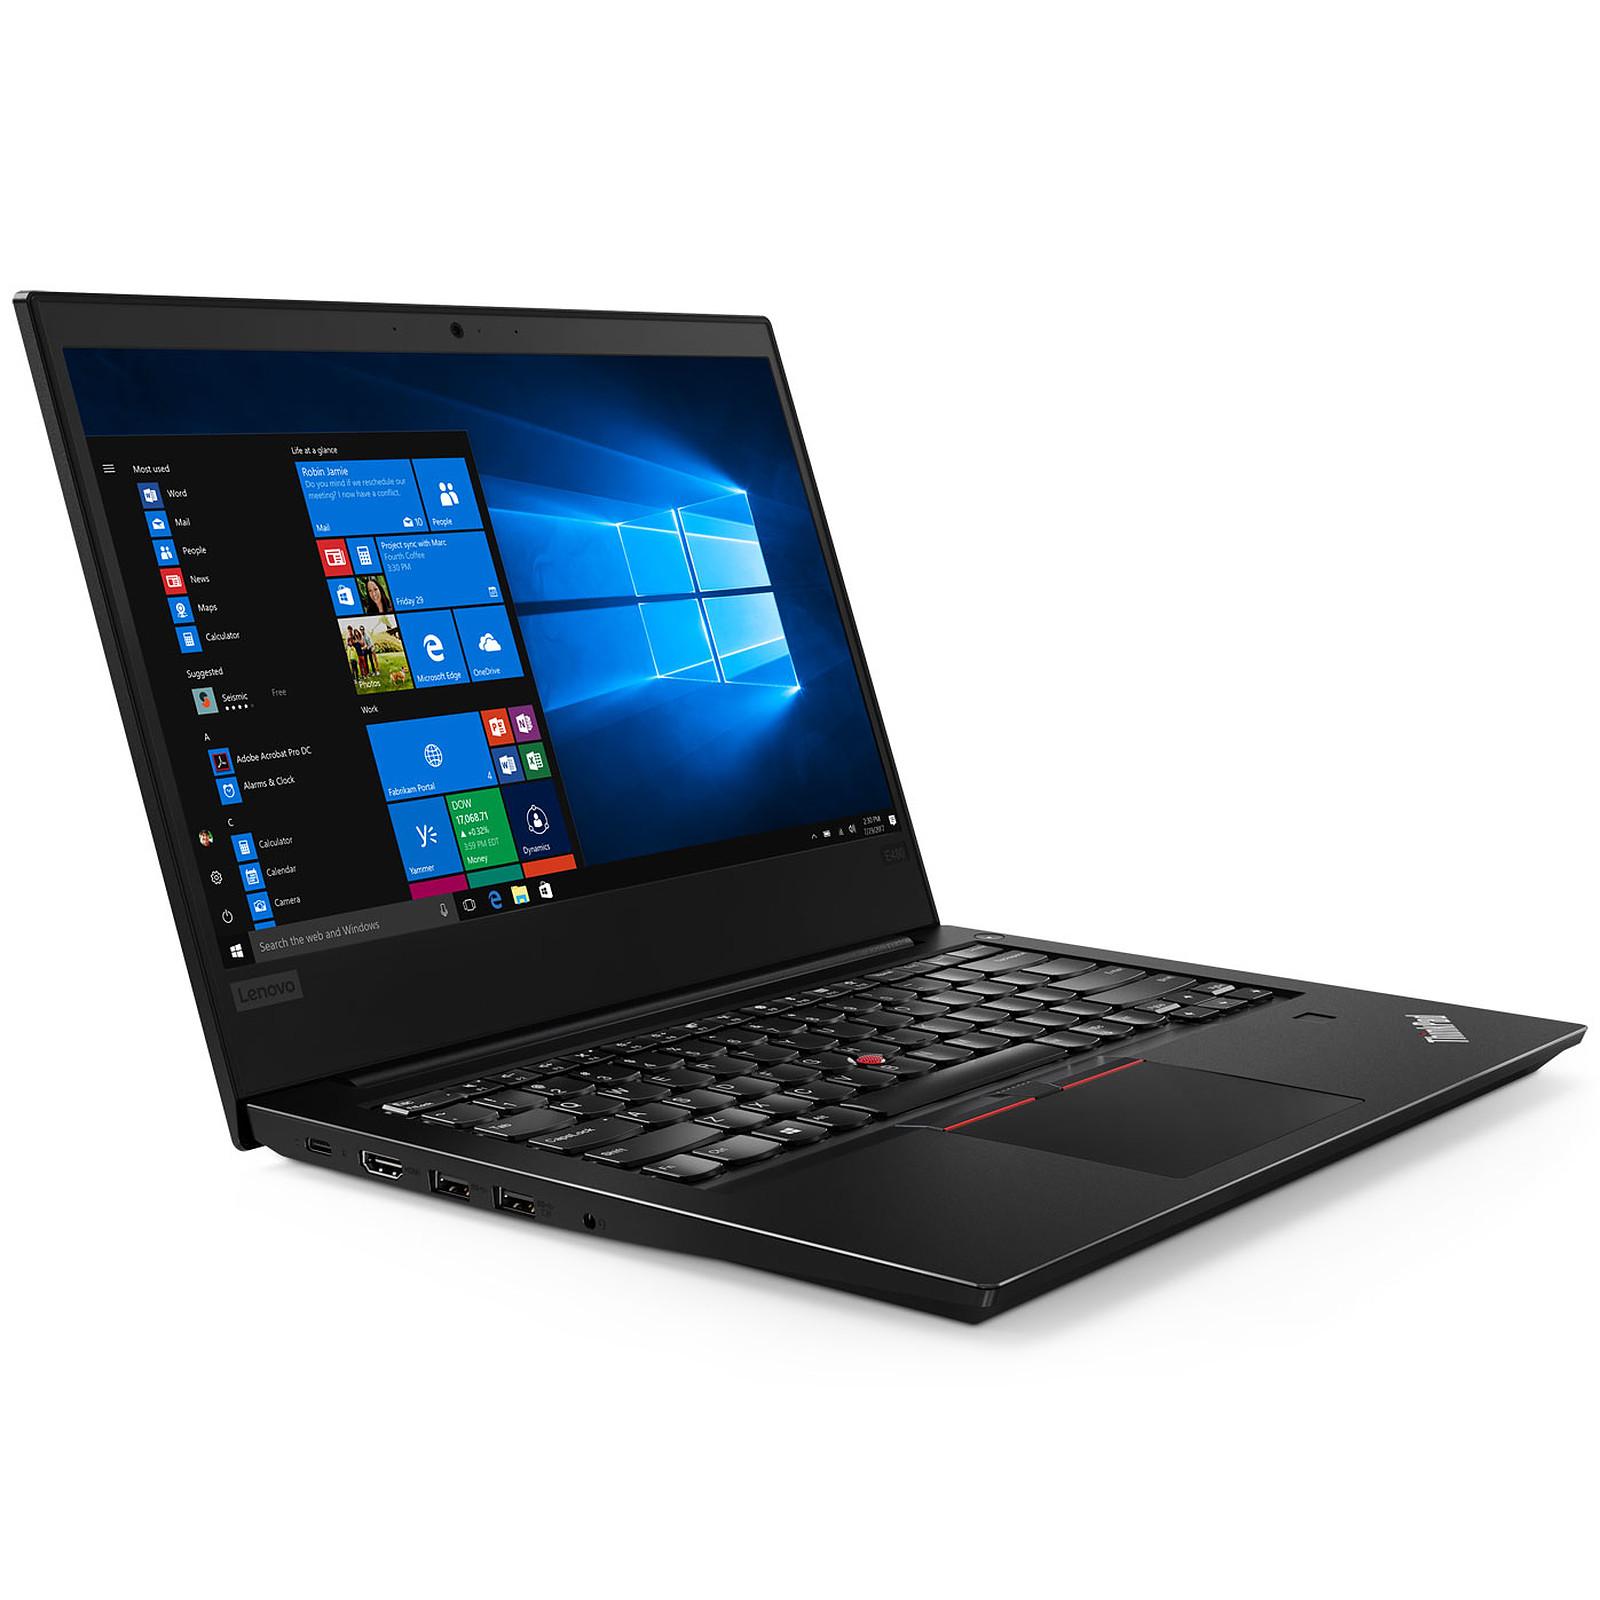 Lenovo ThinkPad E480 (20KN001QFR)